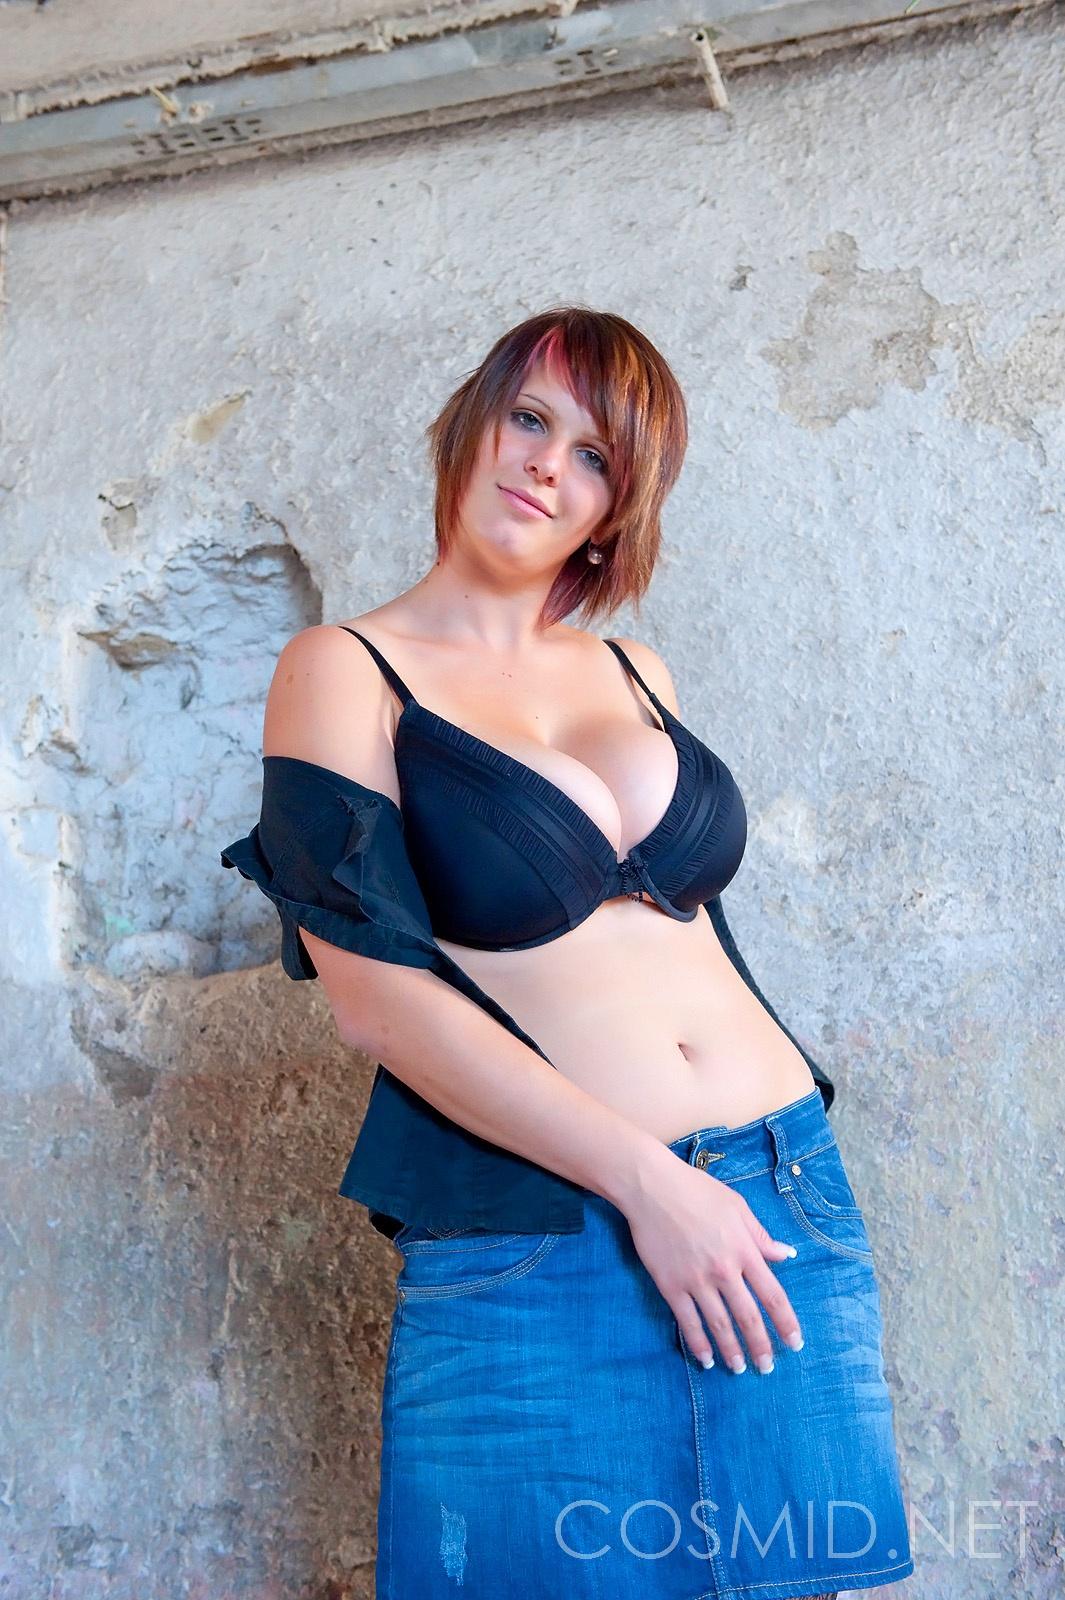 Jenny mcclain oils up her big 36f tits in sauna - 3 part 7